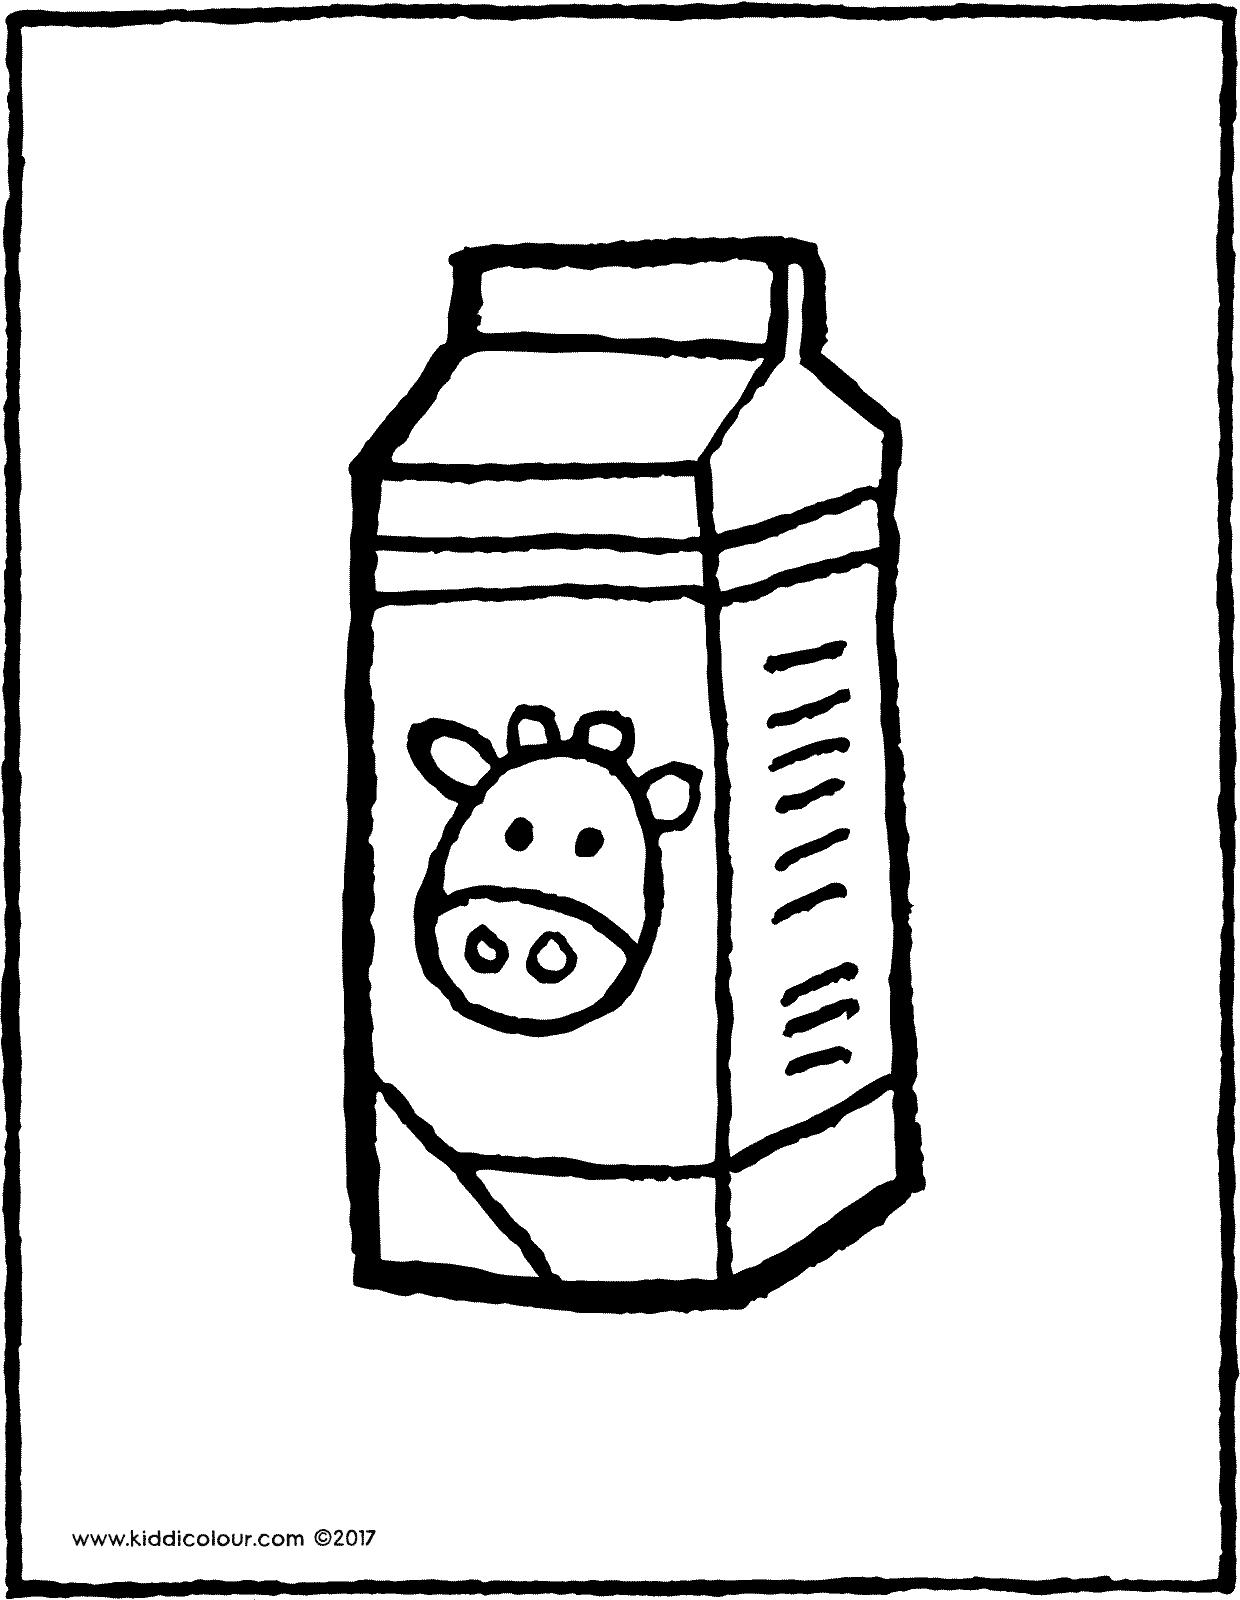 Milk Carton Drawing at GetDrawings.com   Free for personal use Milk ...